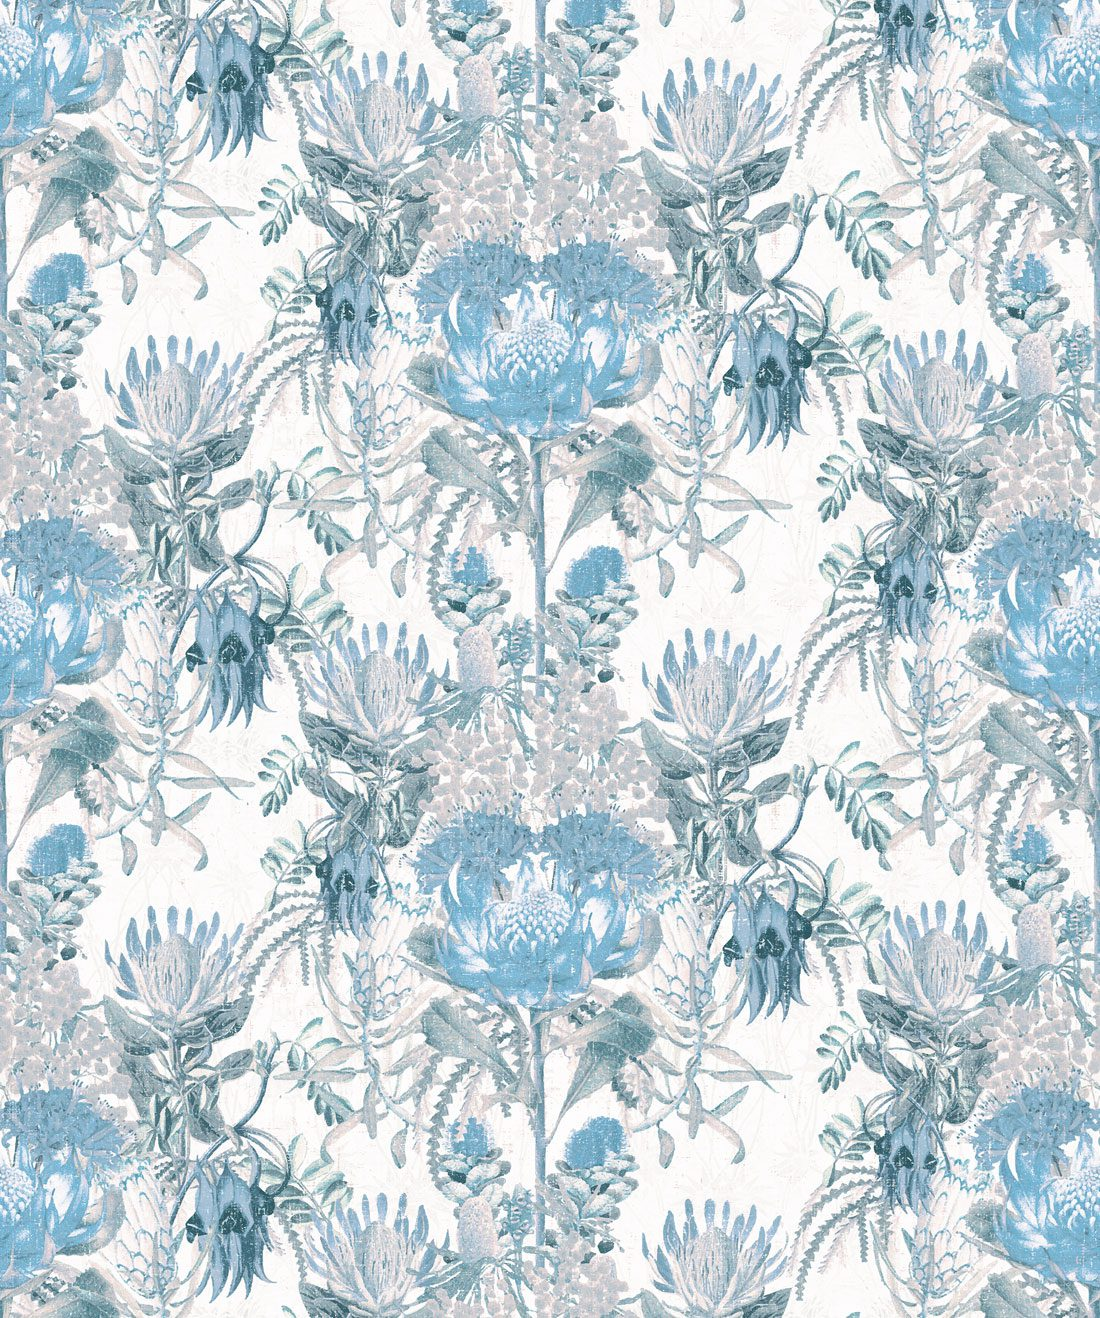 Simcox Wildflowers Blue